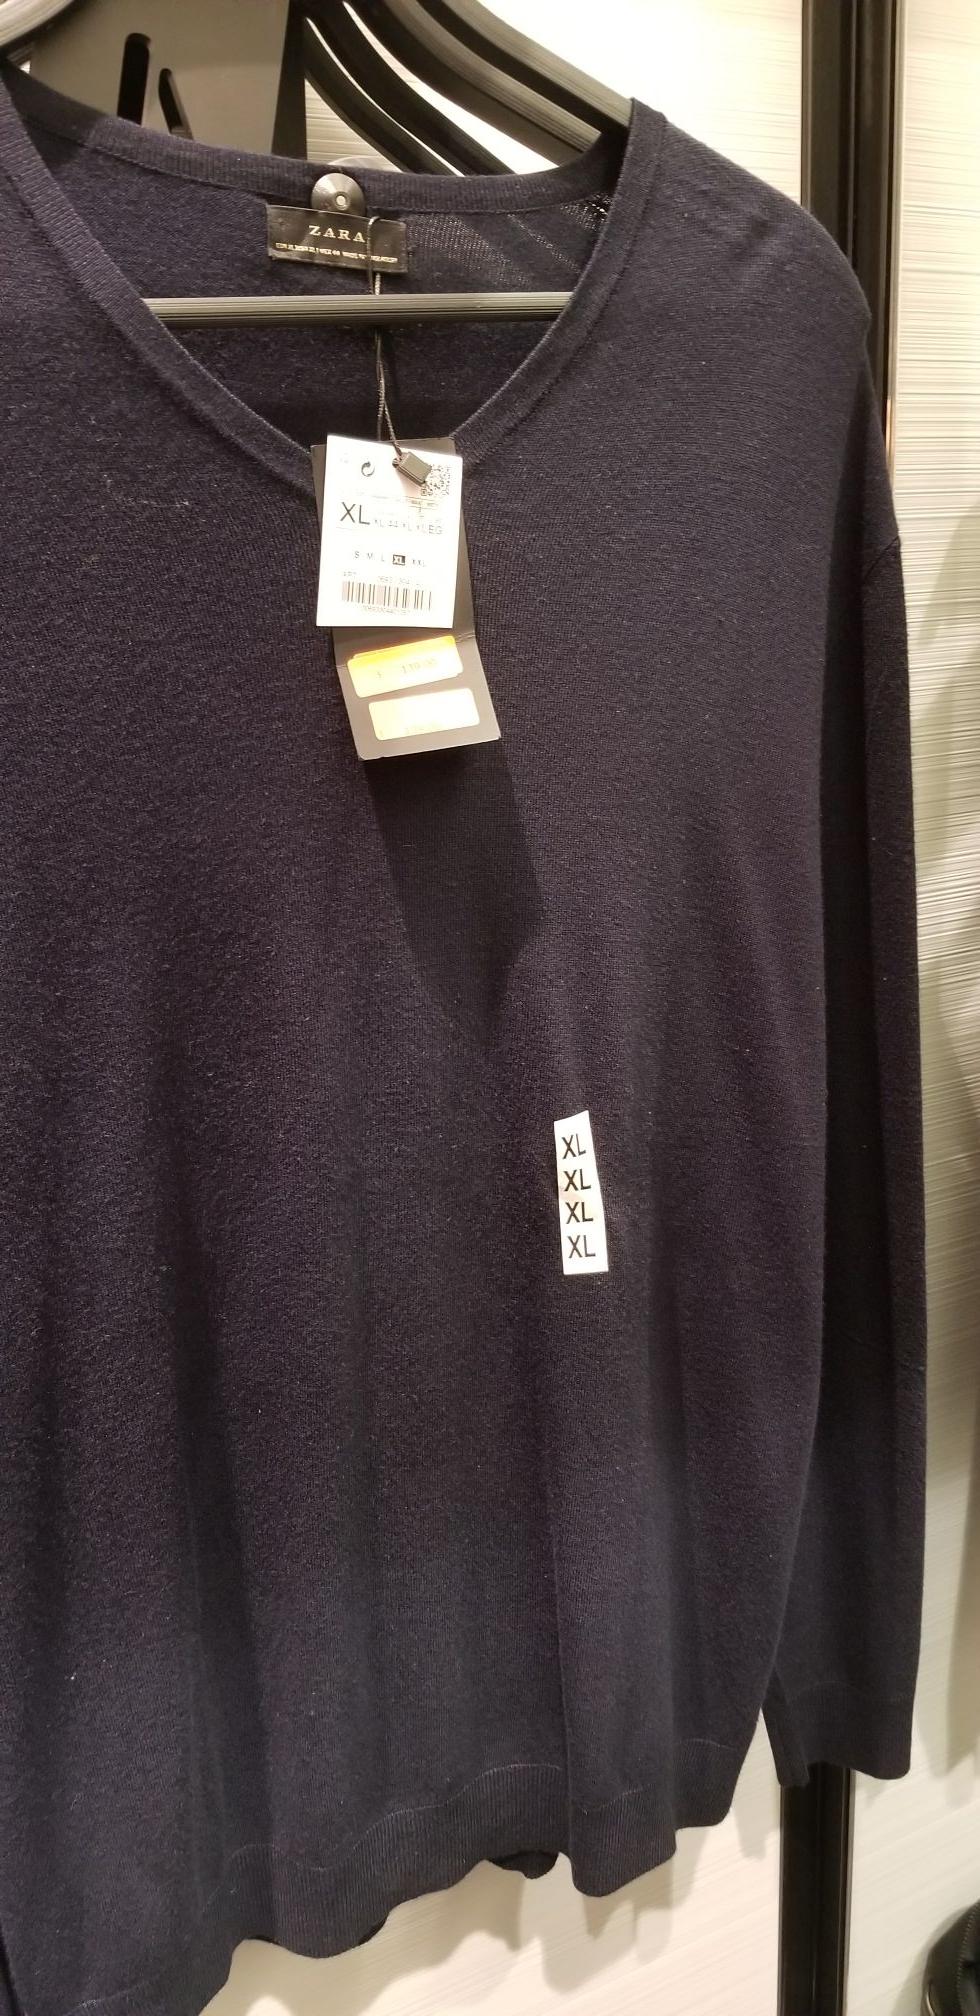 Suéteres Zara tallas XL y XXL